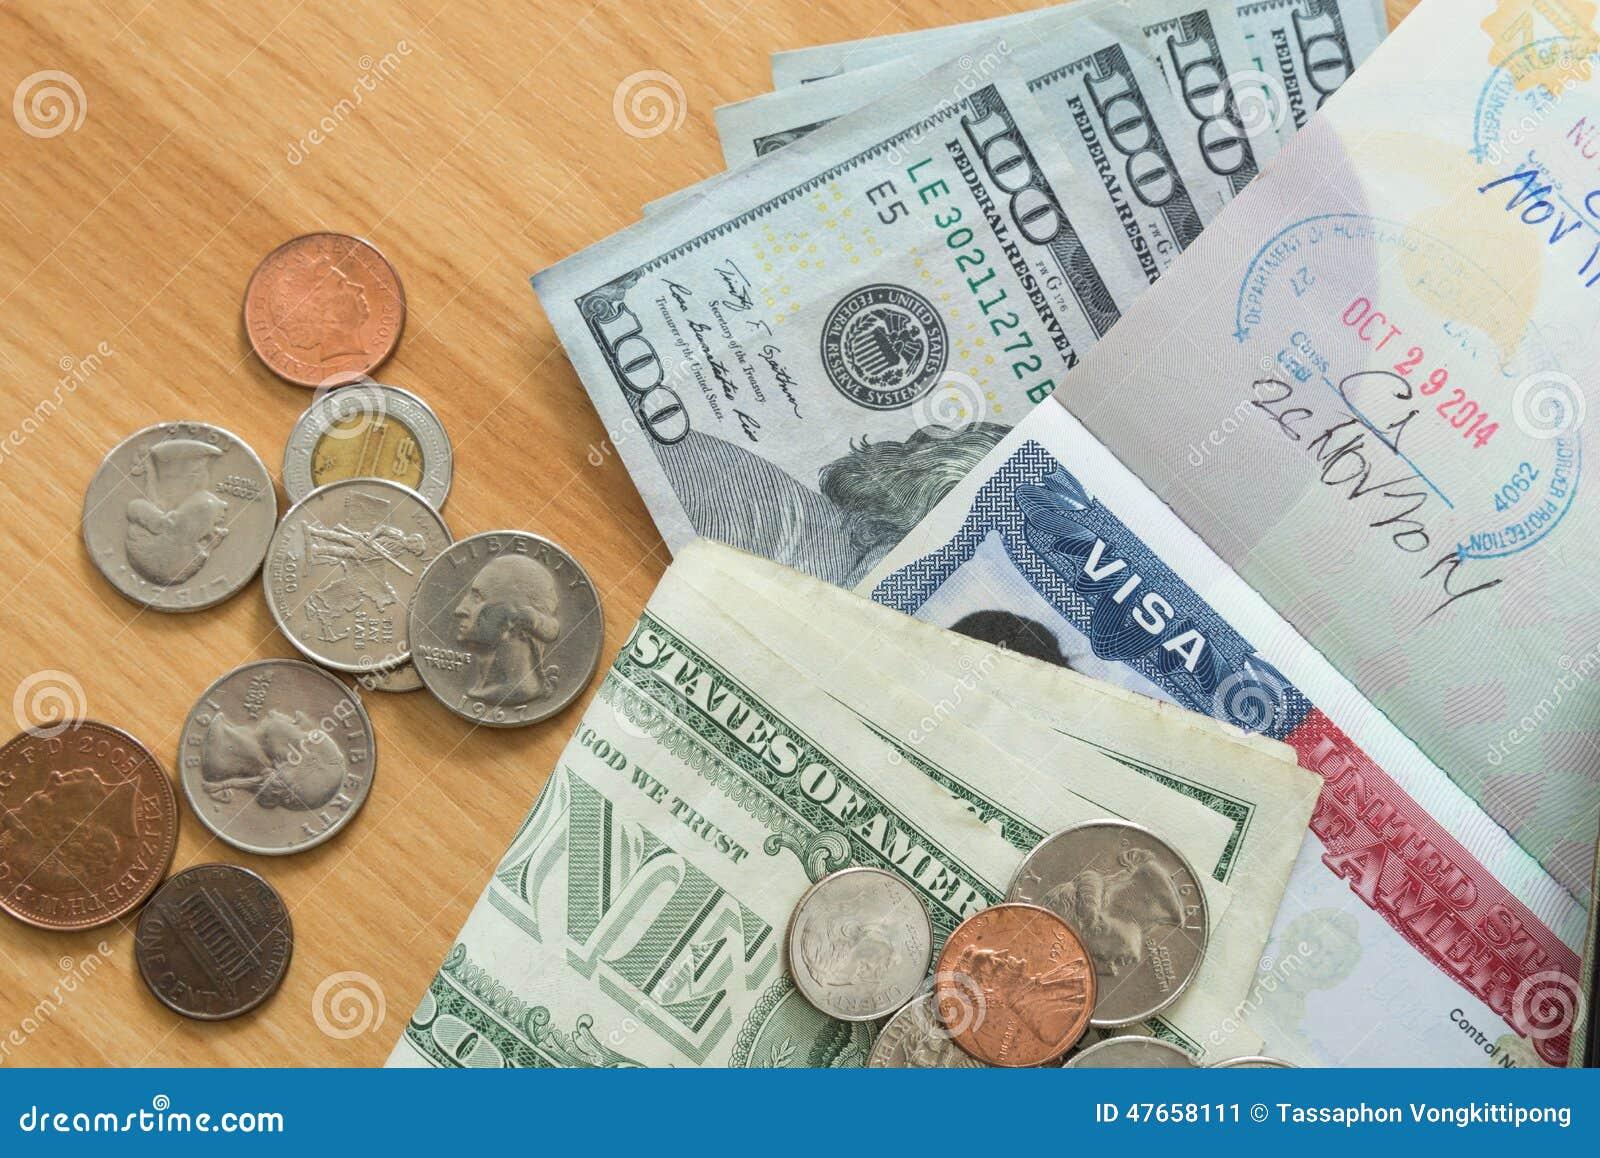 US Visa Passport Dollar Bills Coins Stock Image - Image of